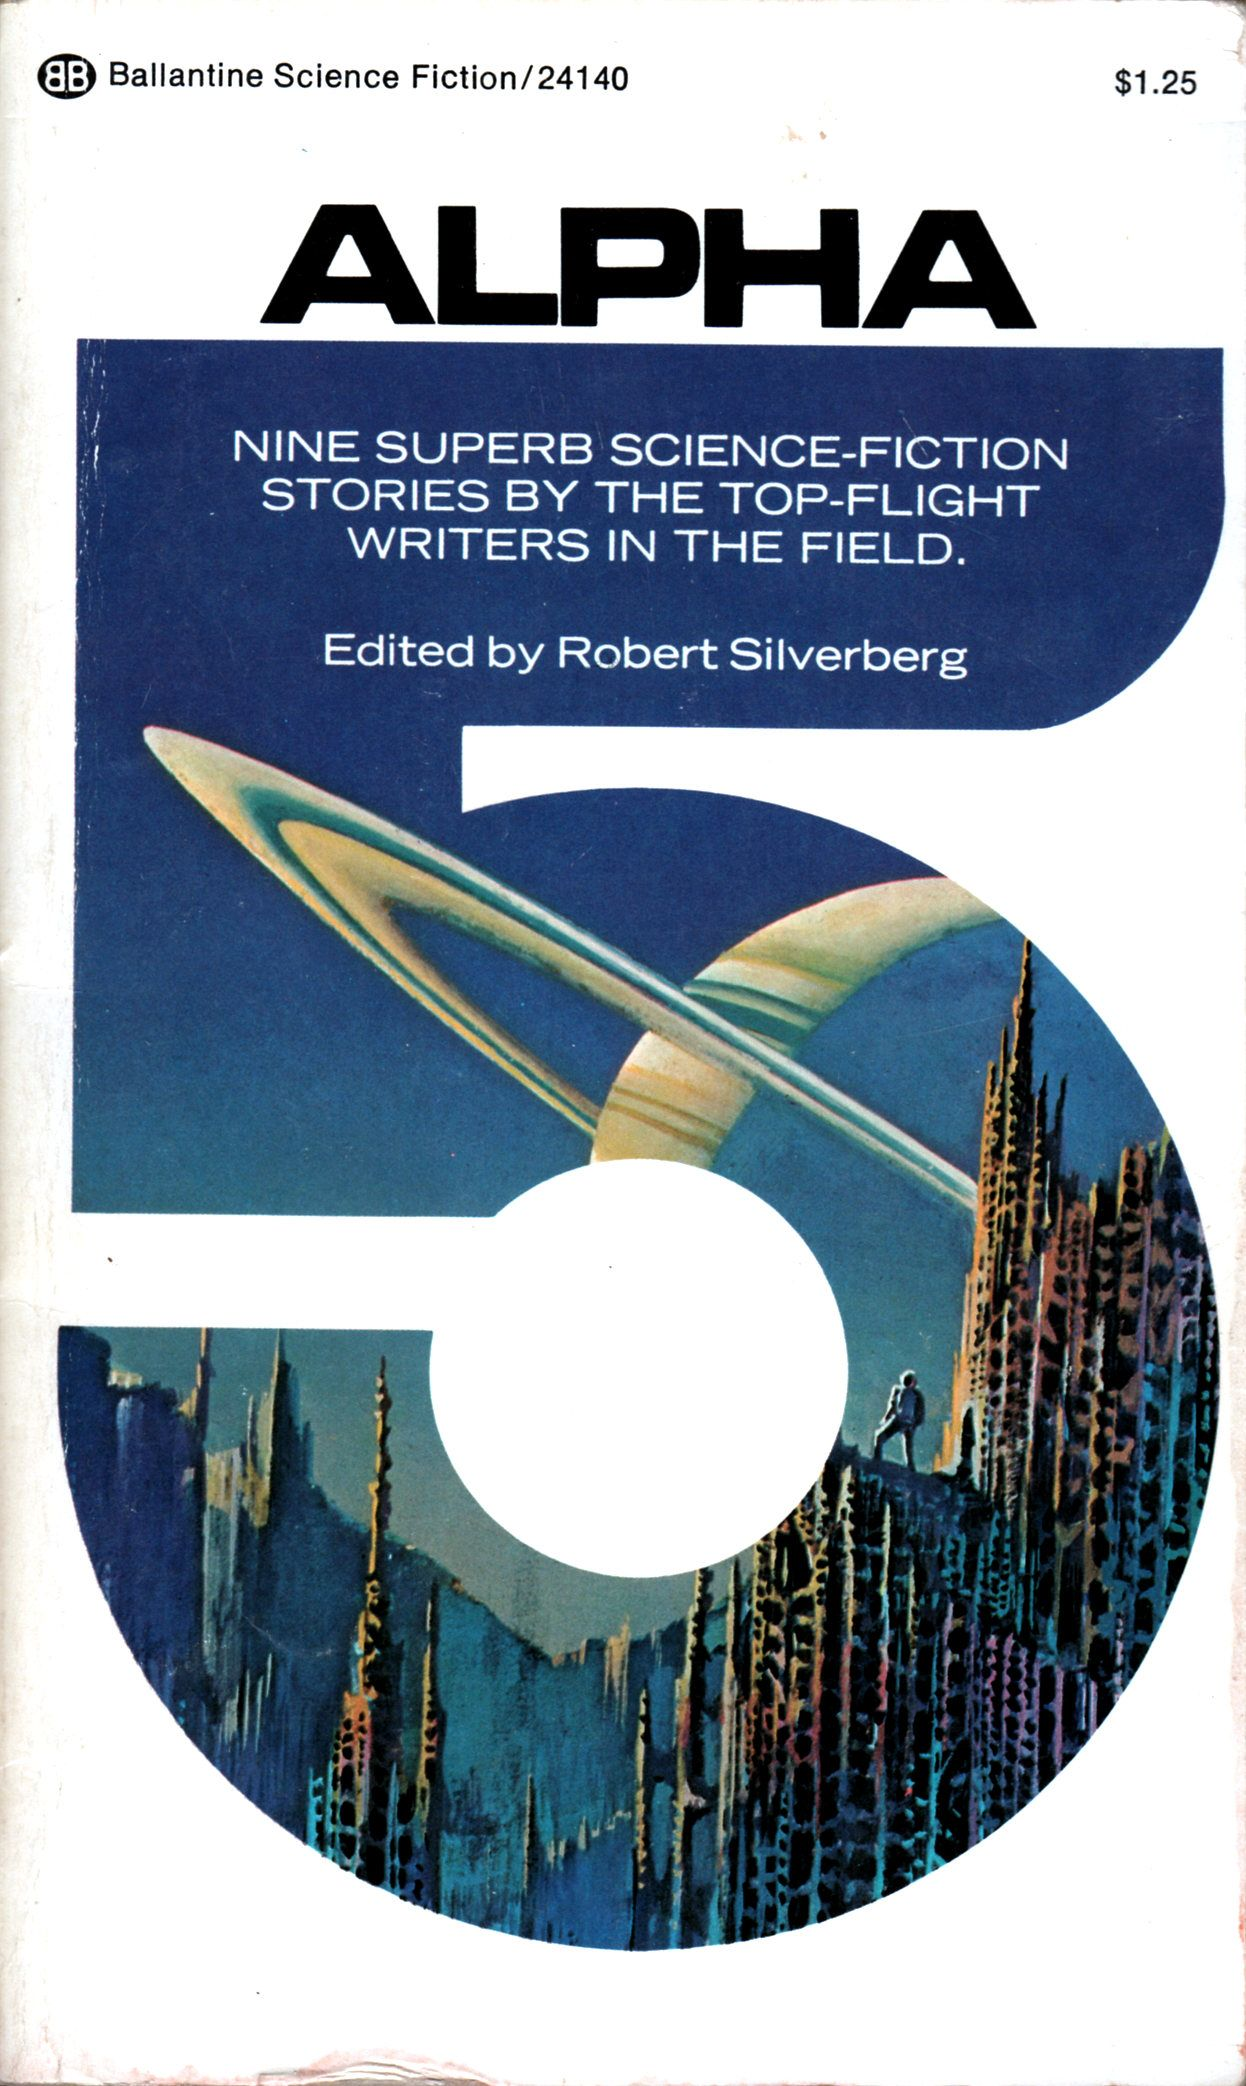 ABOVE: Robert Silverberg, ed., Alpha 5 (NY: Ballantine, 1974